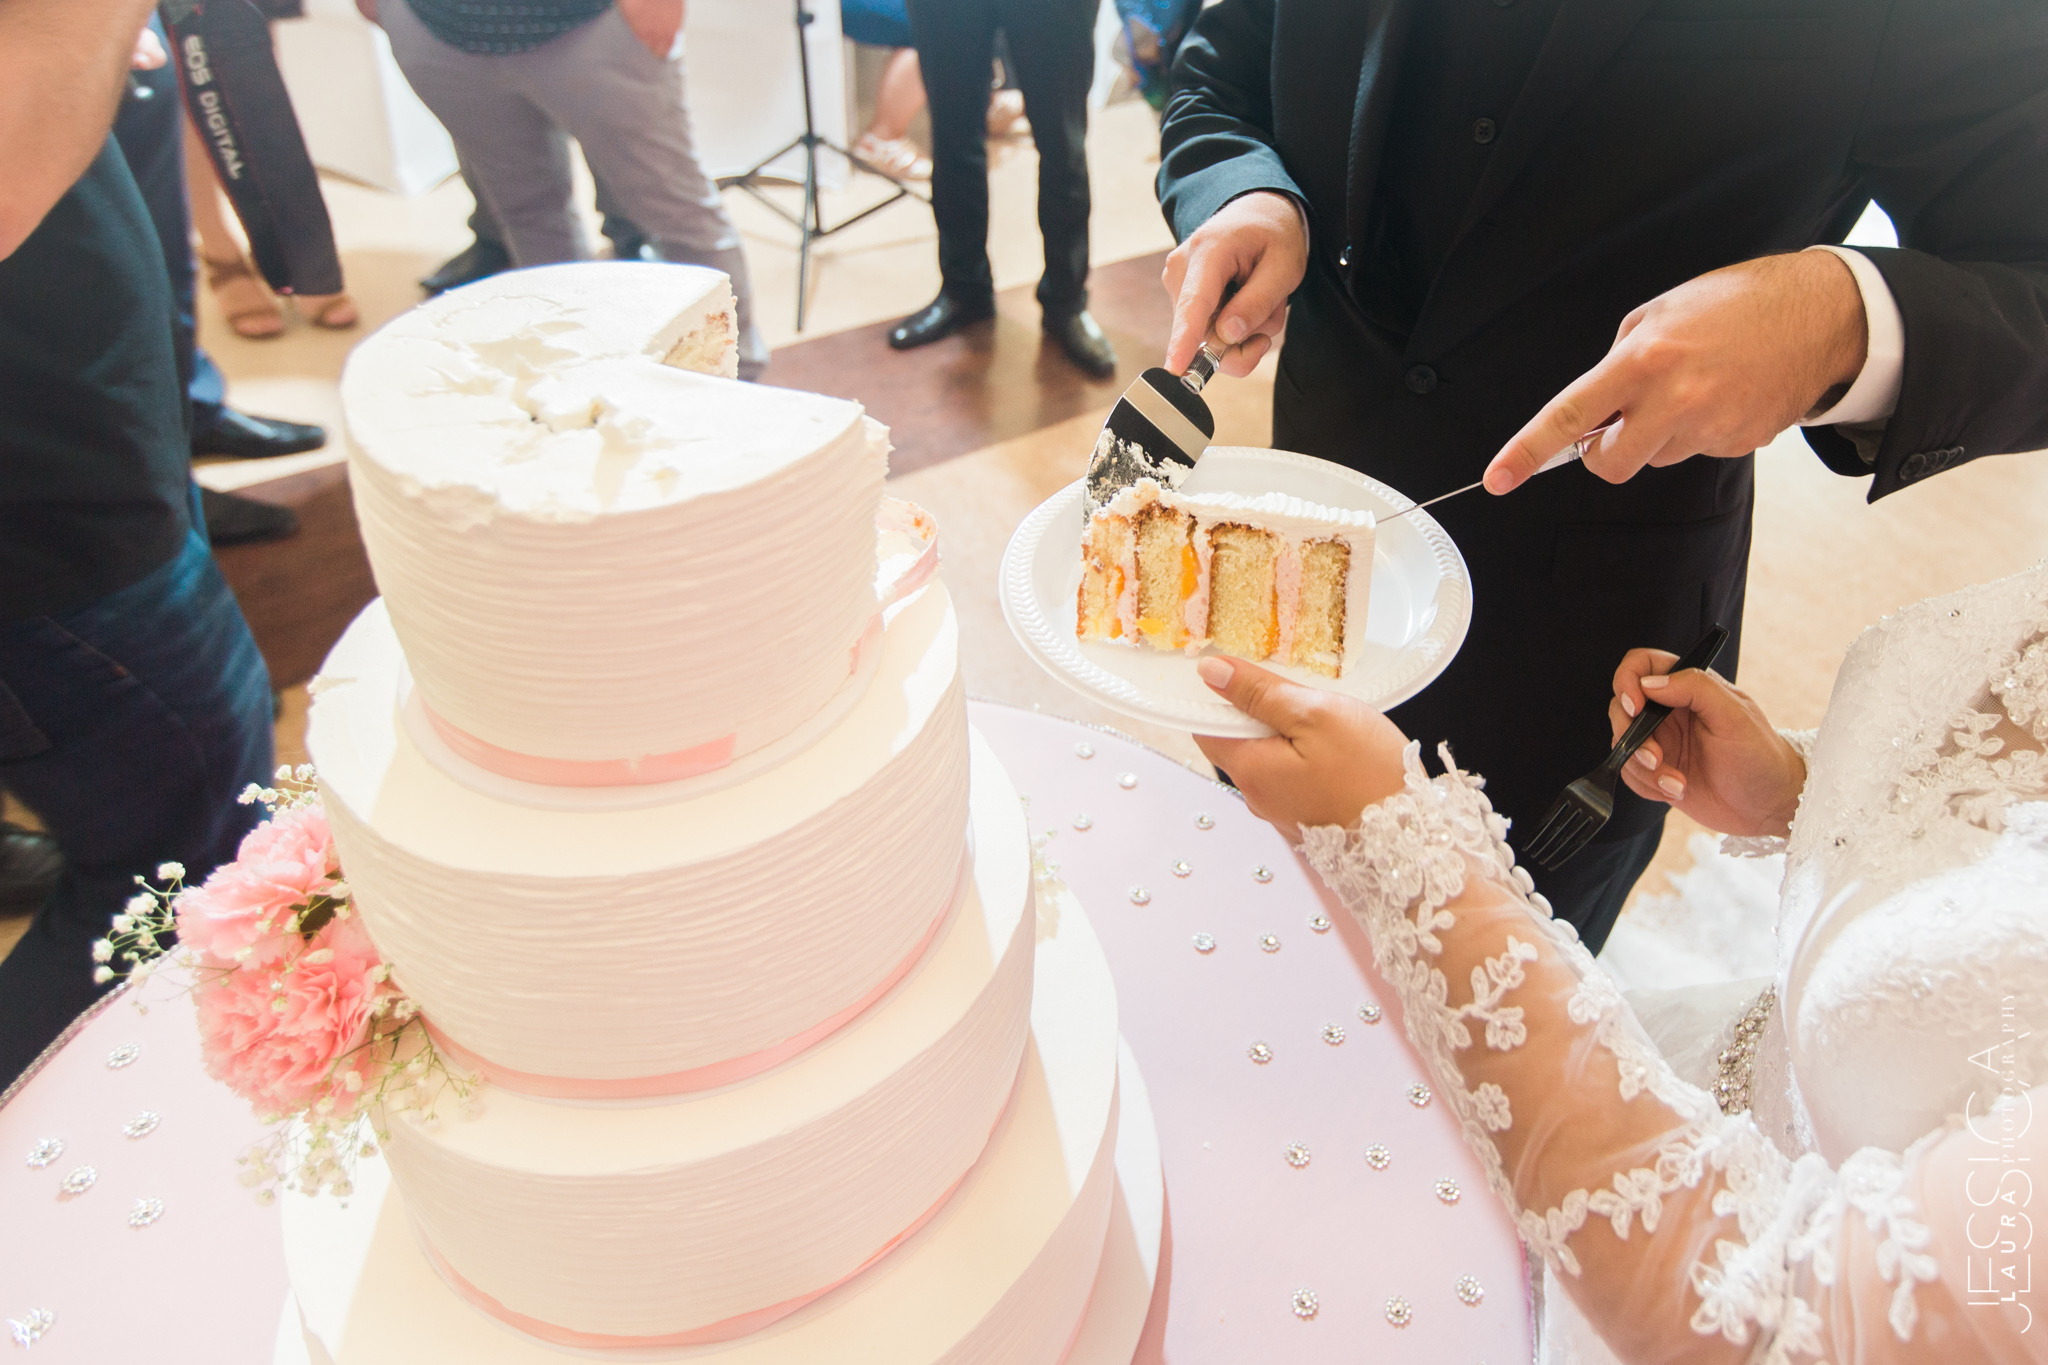 Eugene-Maryana_wedding_08062017_web (521 of 558).JPG